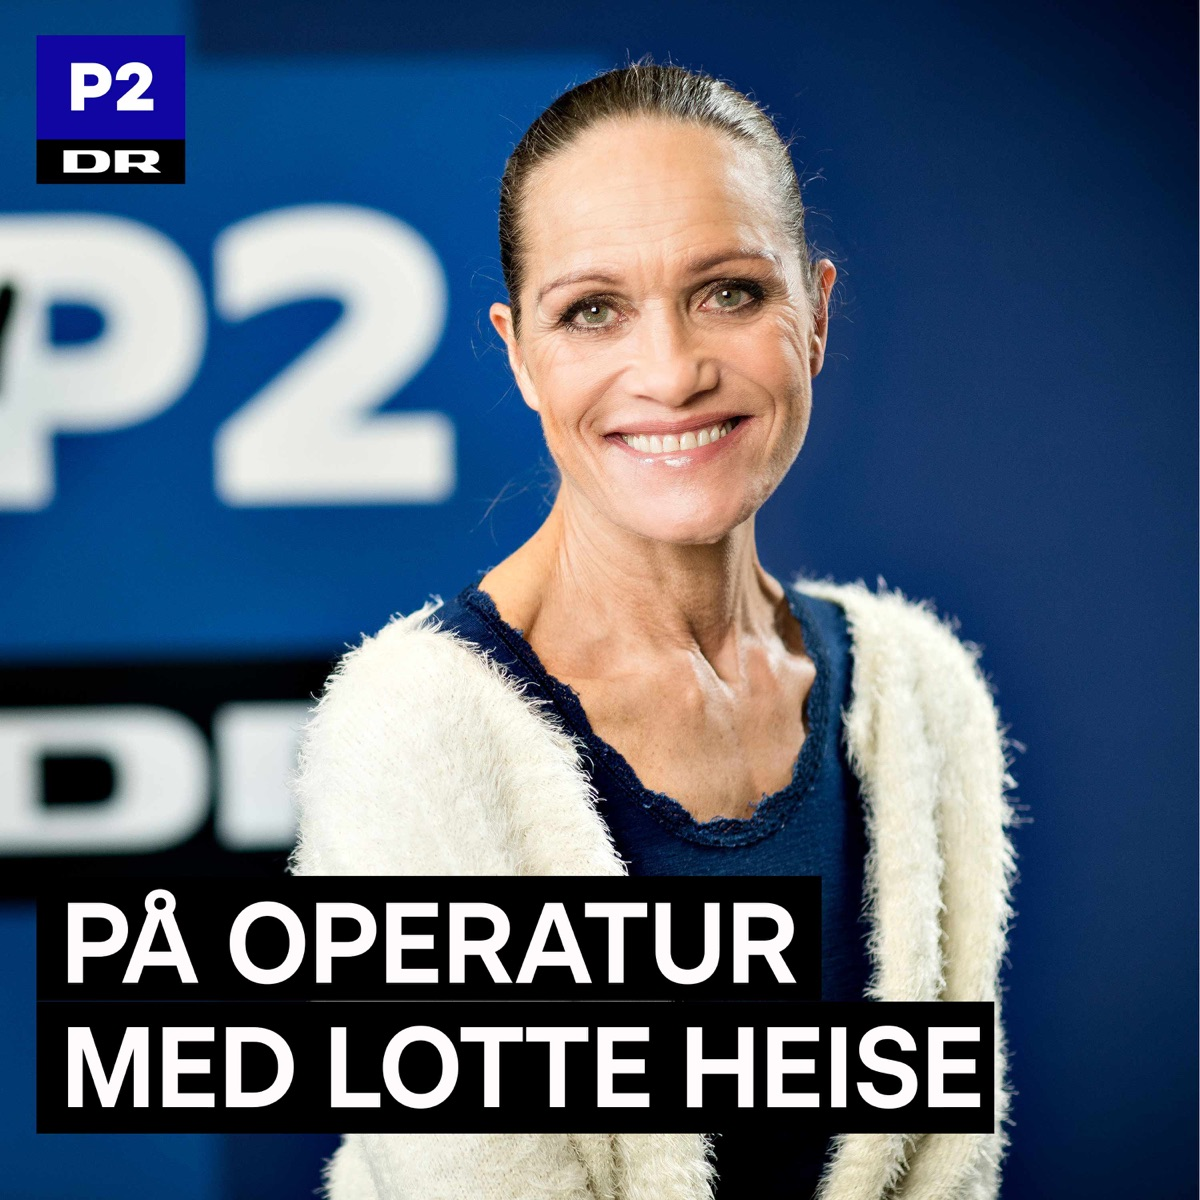 På operatur med Lotte Heise